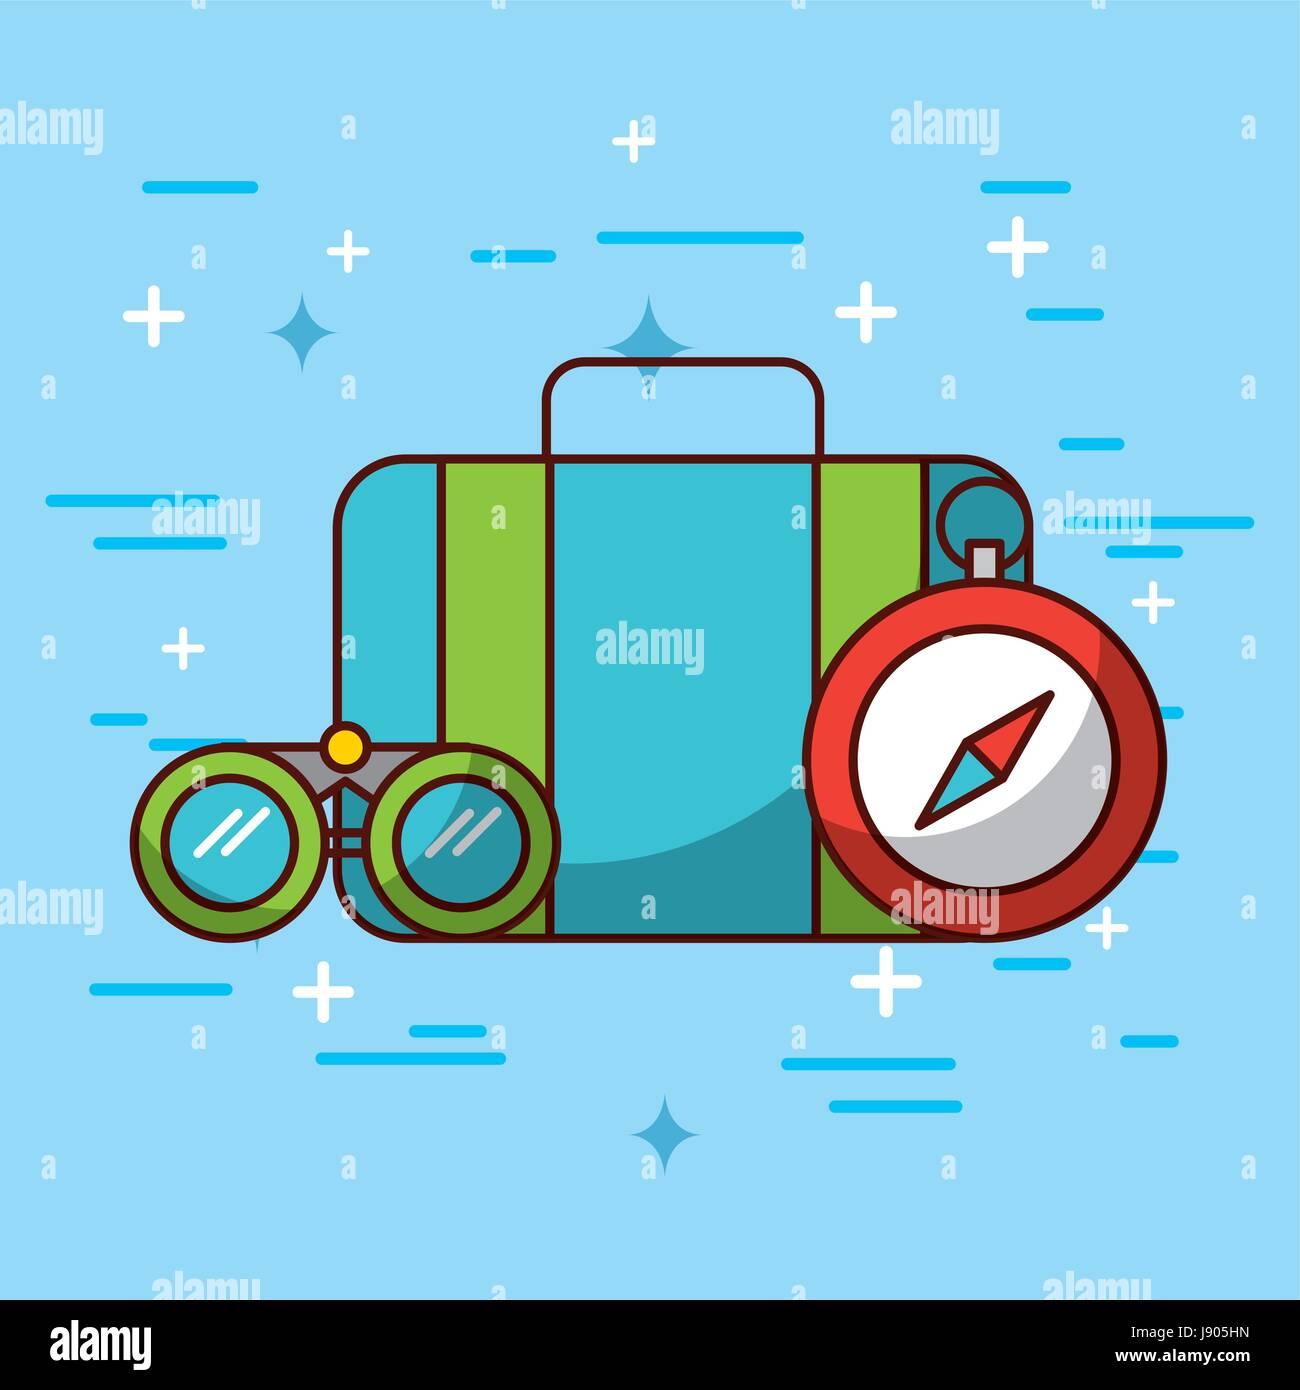 indications travel illustration - Stock Image